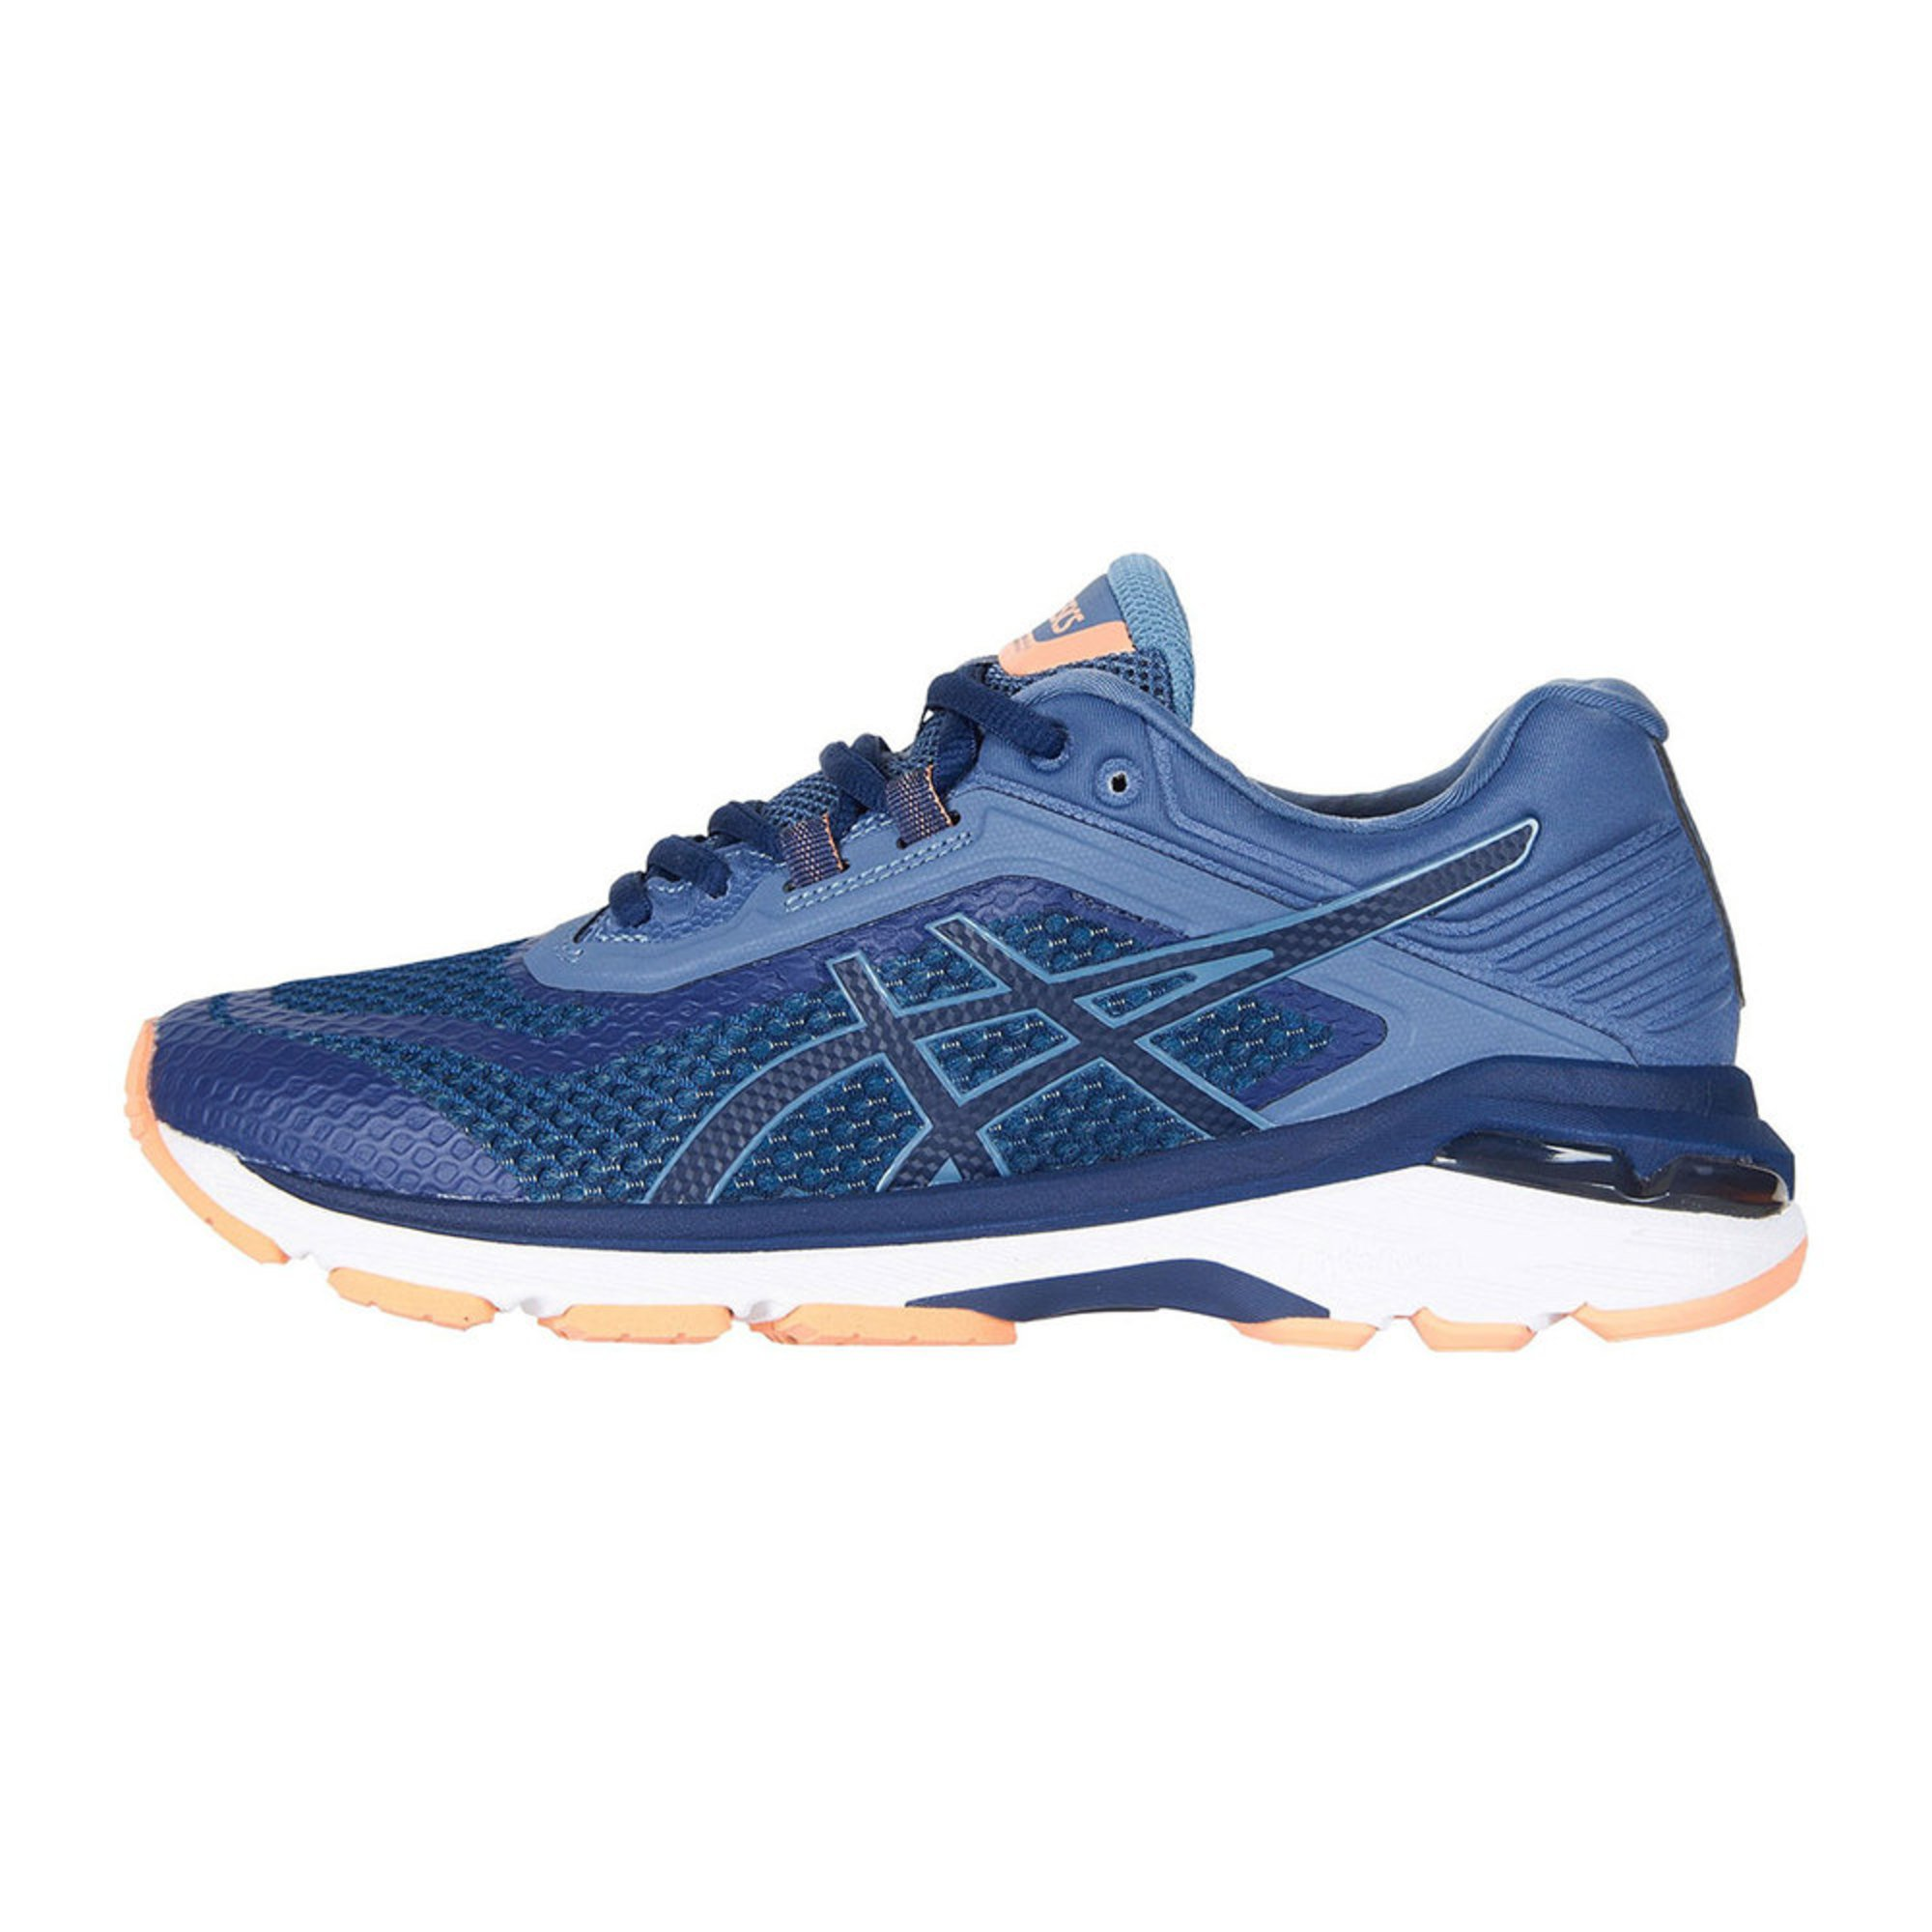 Asics Blue Gt 2000 6 6 Chaussure pied de course à pied Indigo Blue/ Indigo Blue 8512c69 - sbsgrp.website